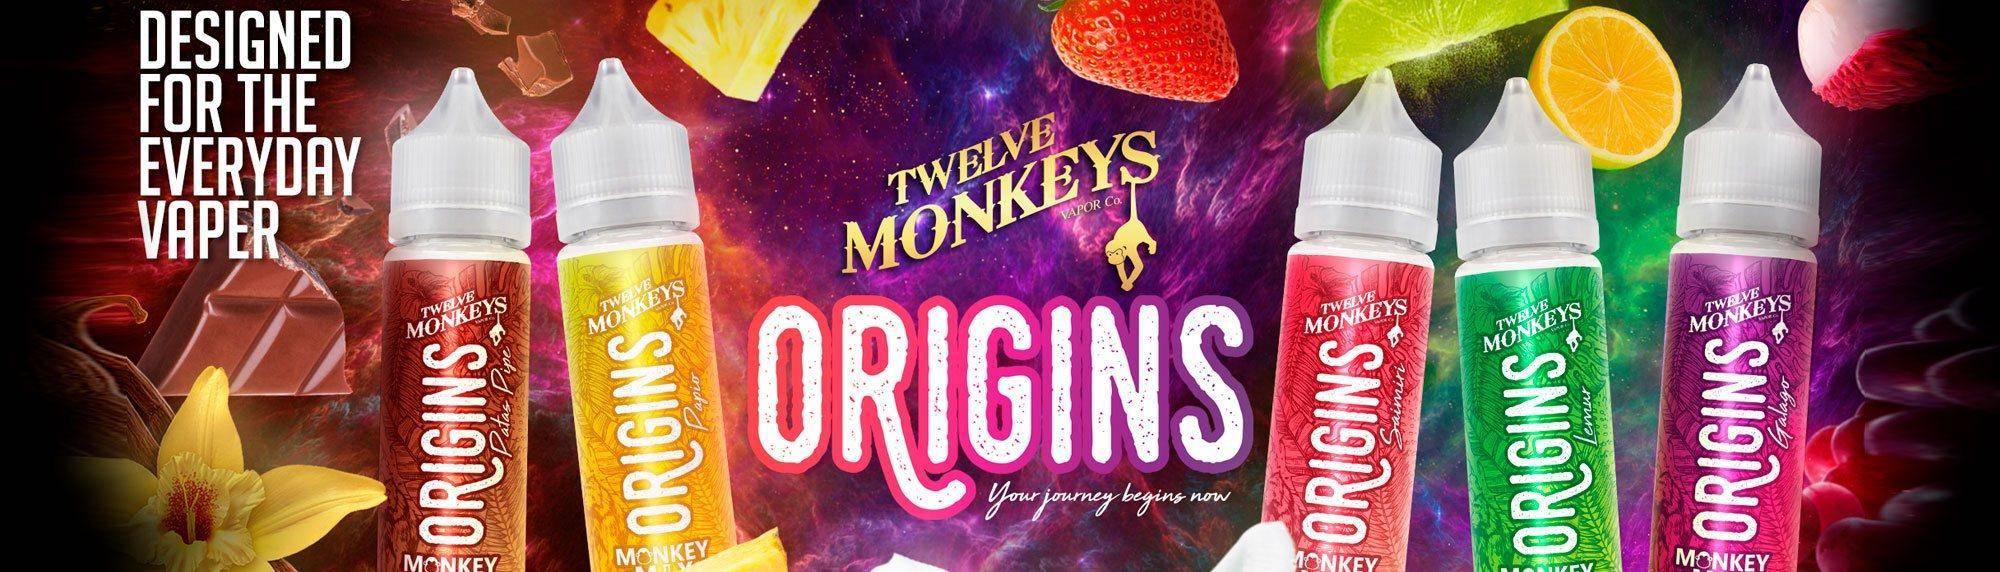 Origins Twelve Monkeys